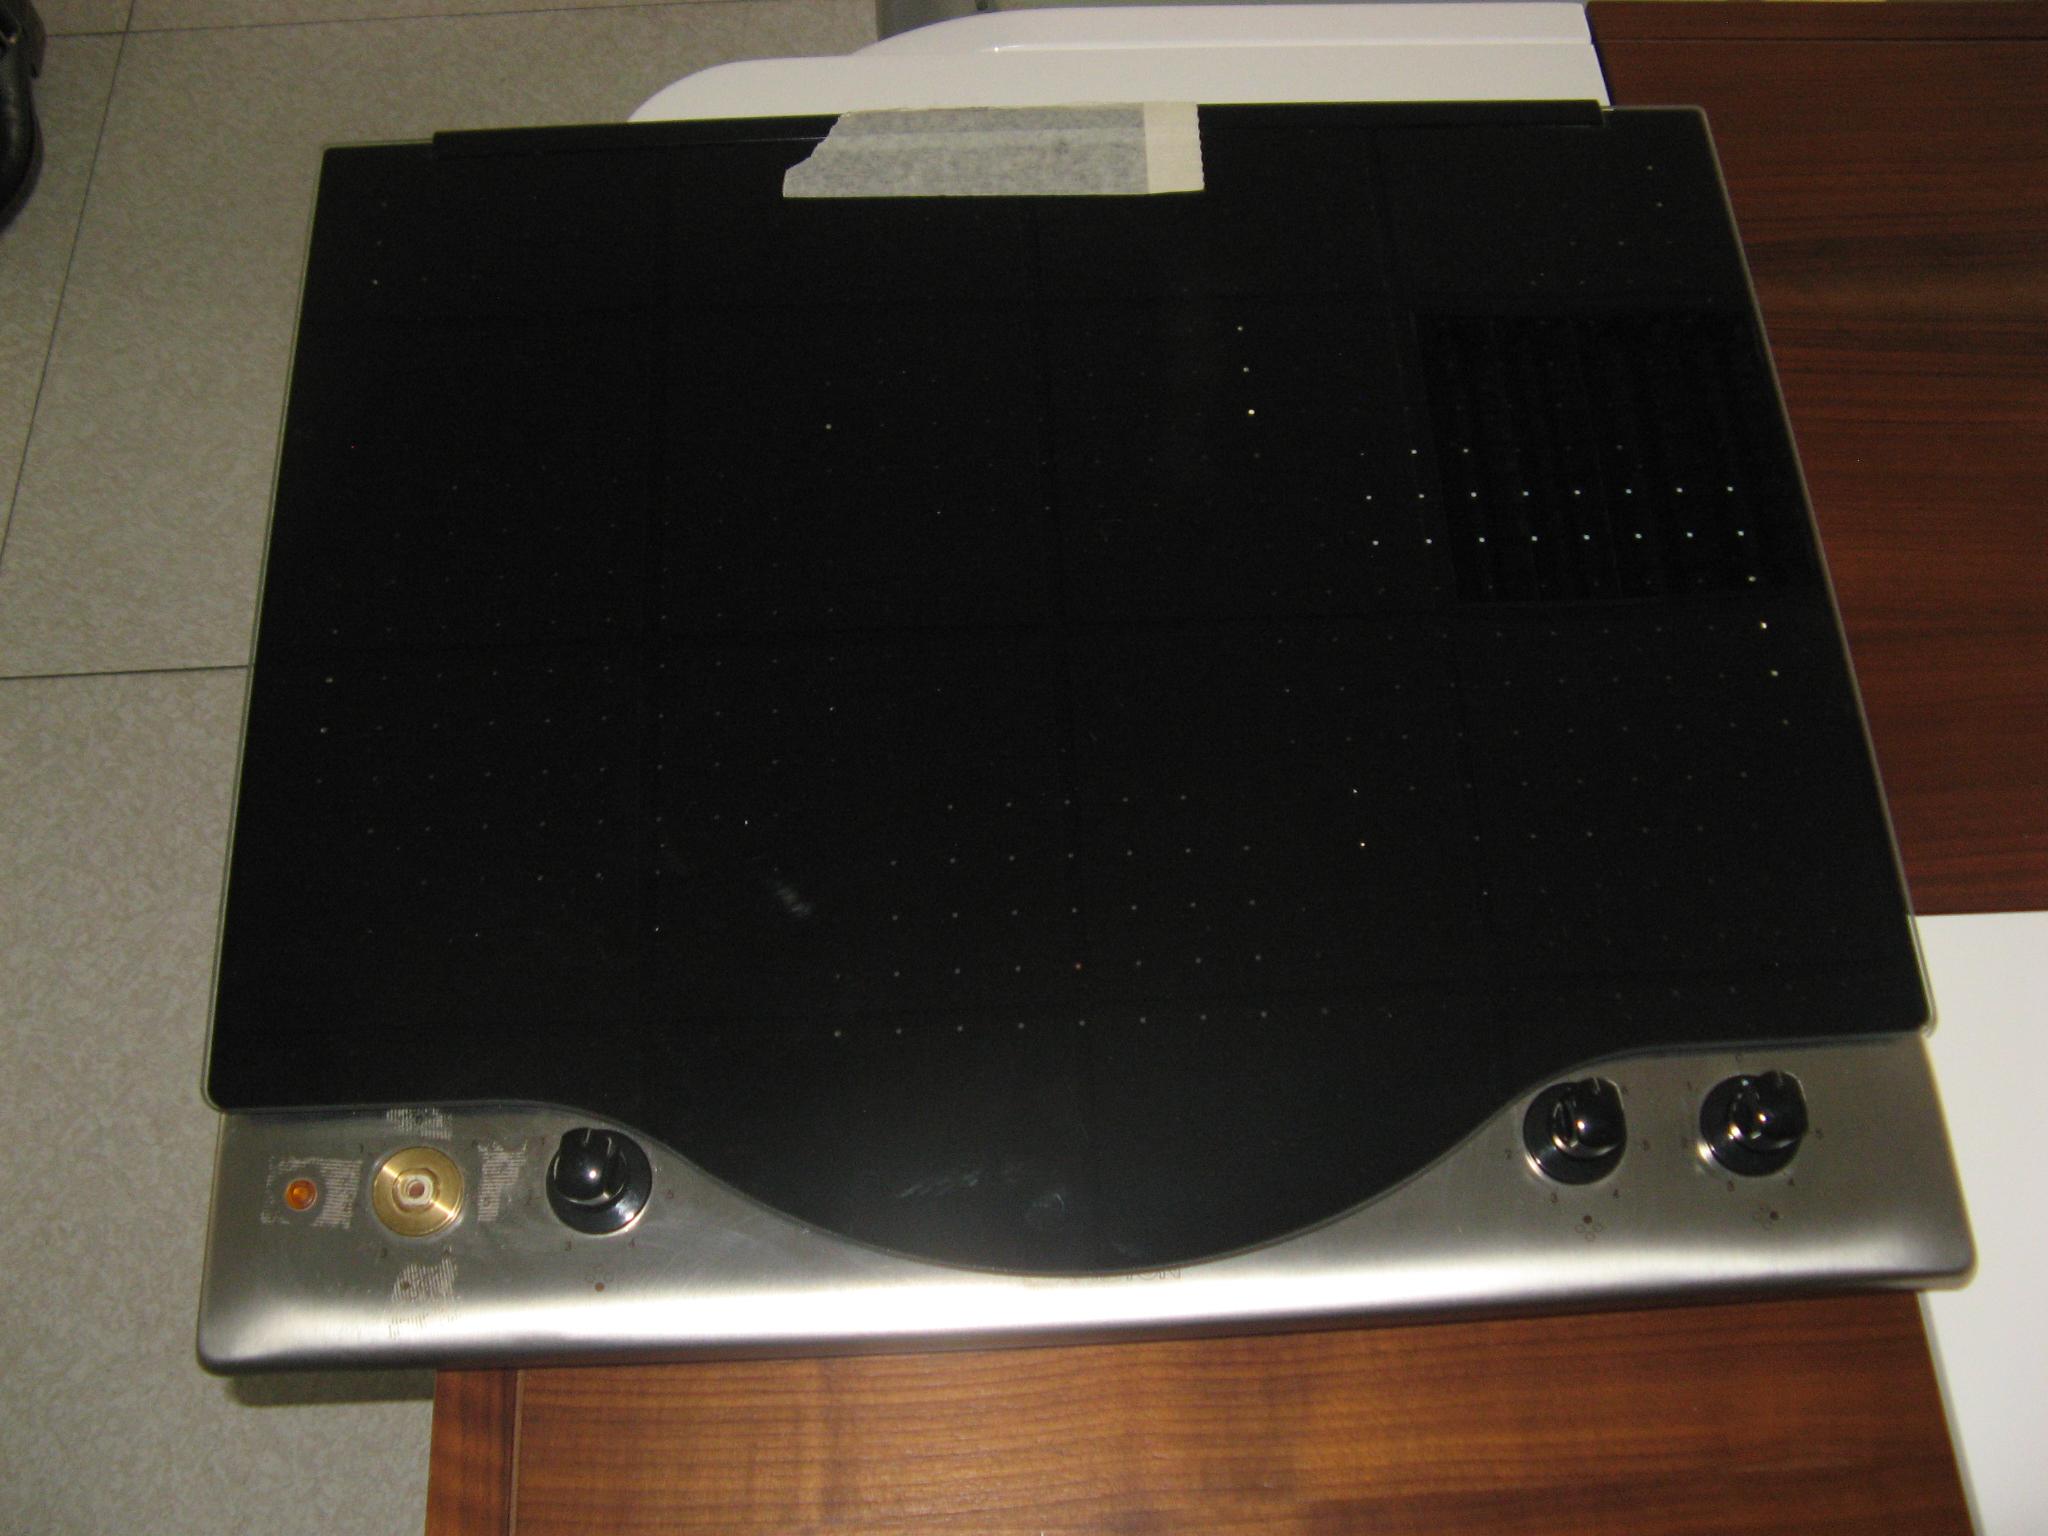 plita ar PH604 (1)